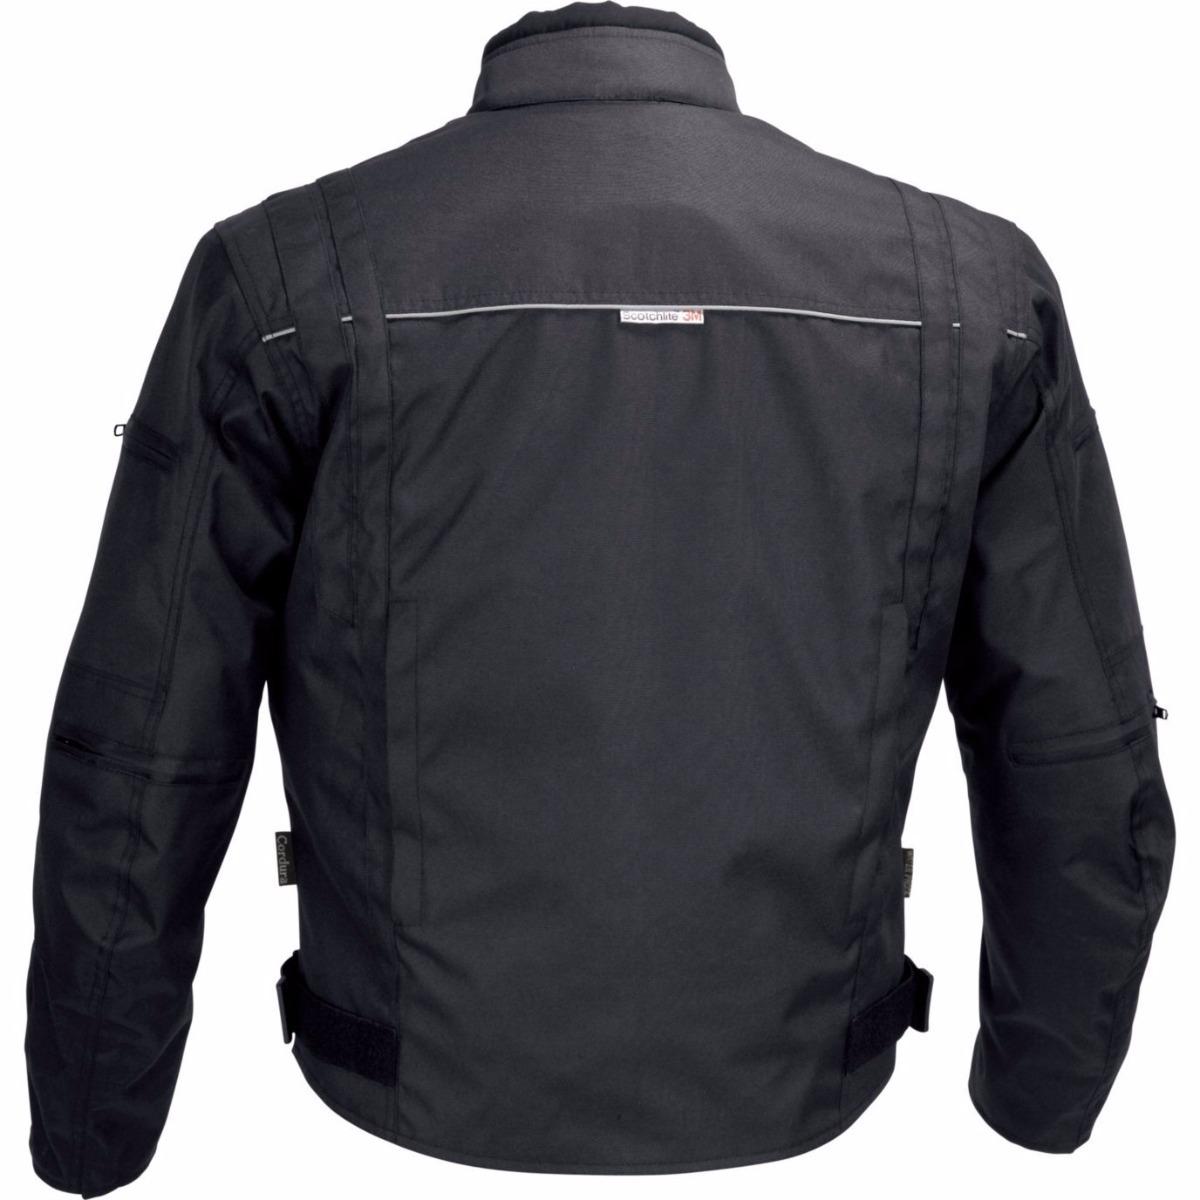 d5aa6298ab8 Chamarra De Motociclista Para Hombre Impermeable Negra -   687.159 ...